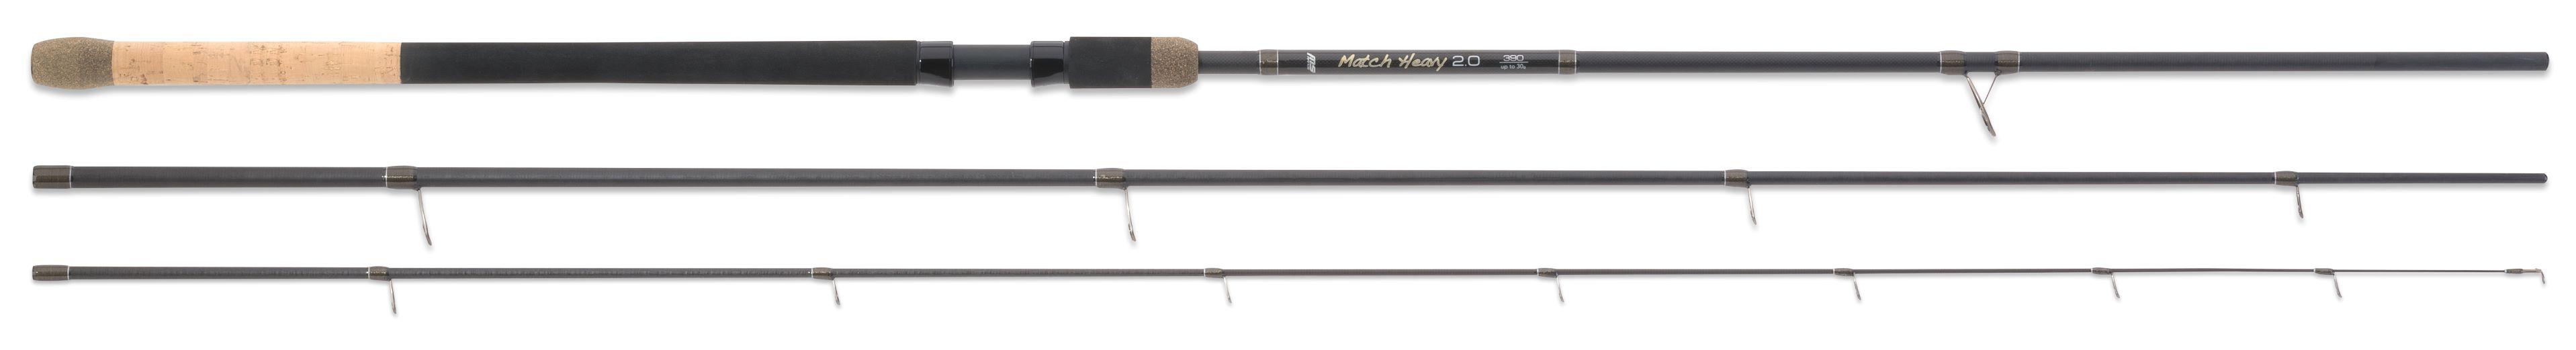 MS Range prut Match Heavy 2.0, 3,6 m, 30 g